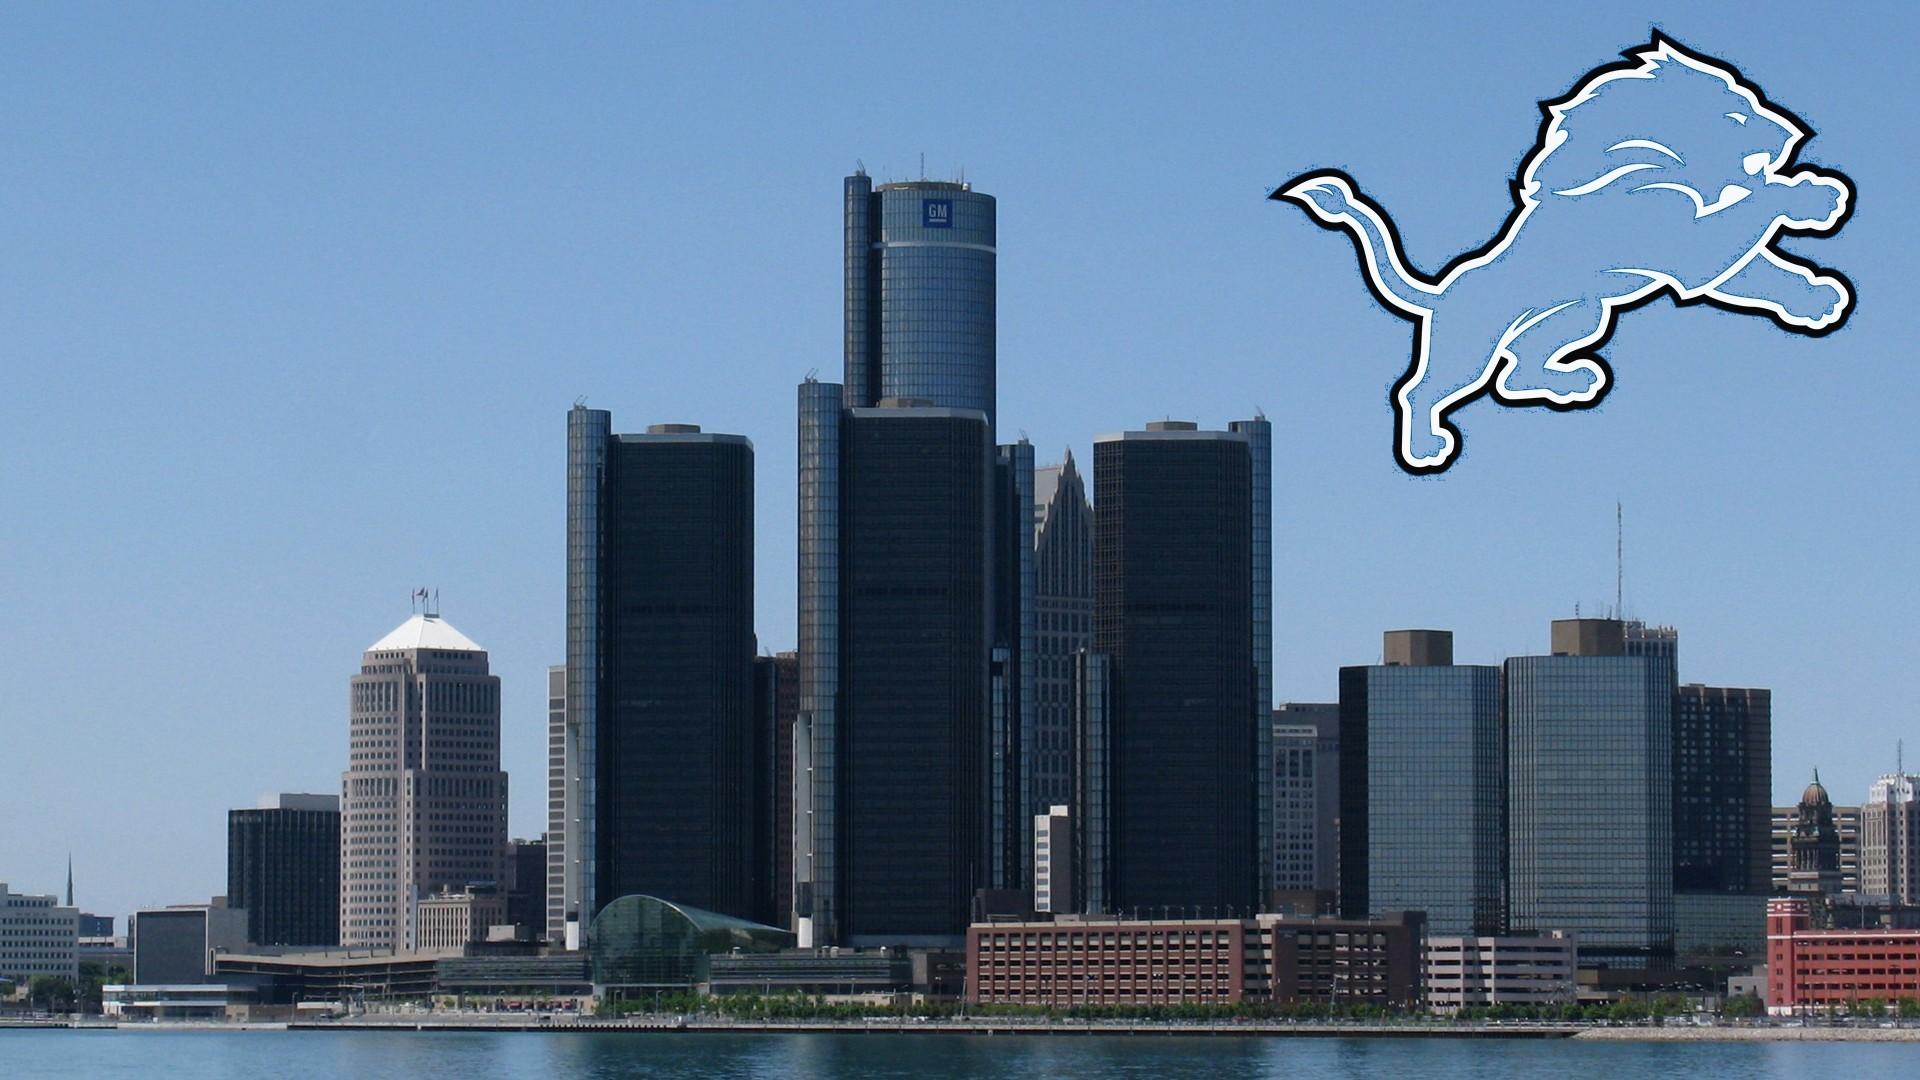 Calvin Johnson Detroit Lions Wallpaper | Cool Pictures | Pinterest | Detroit  lions wallpaper